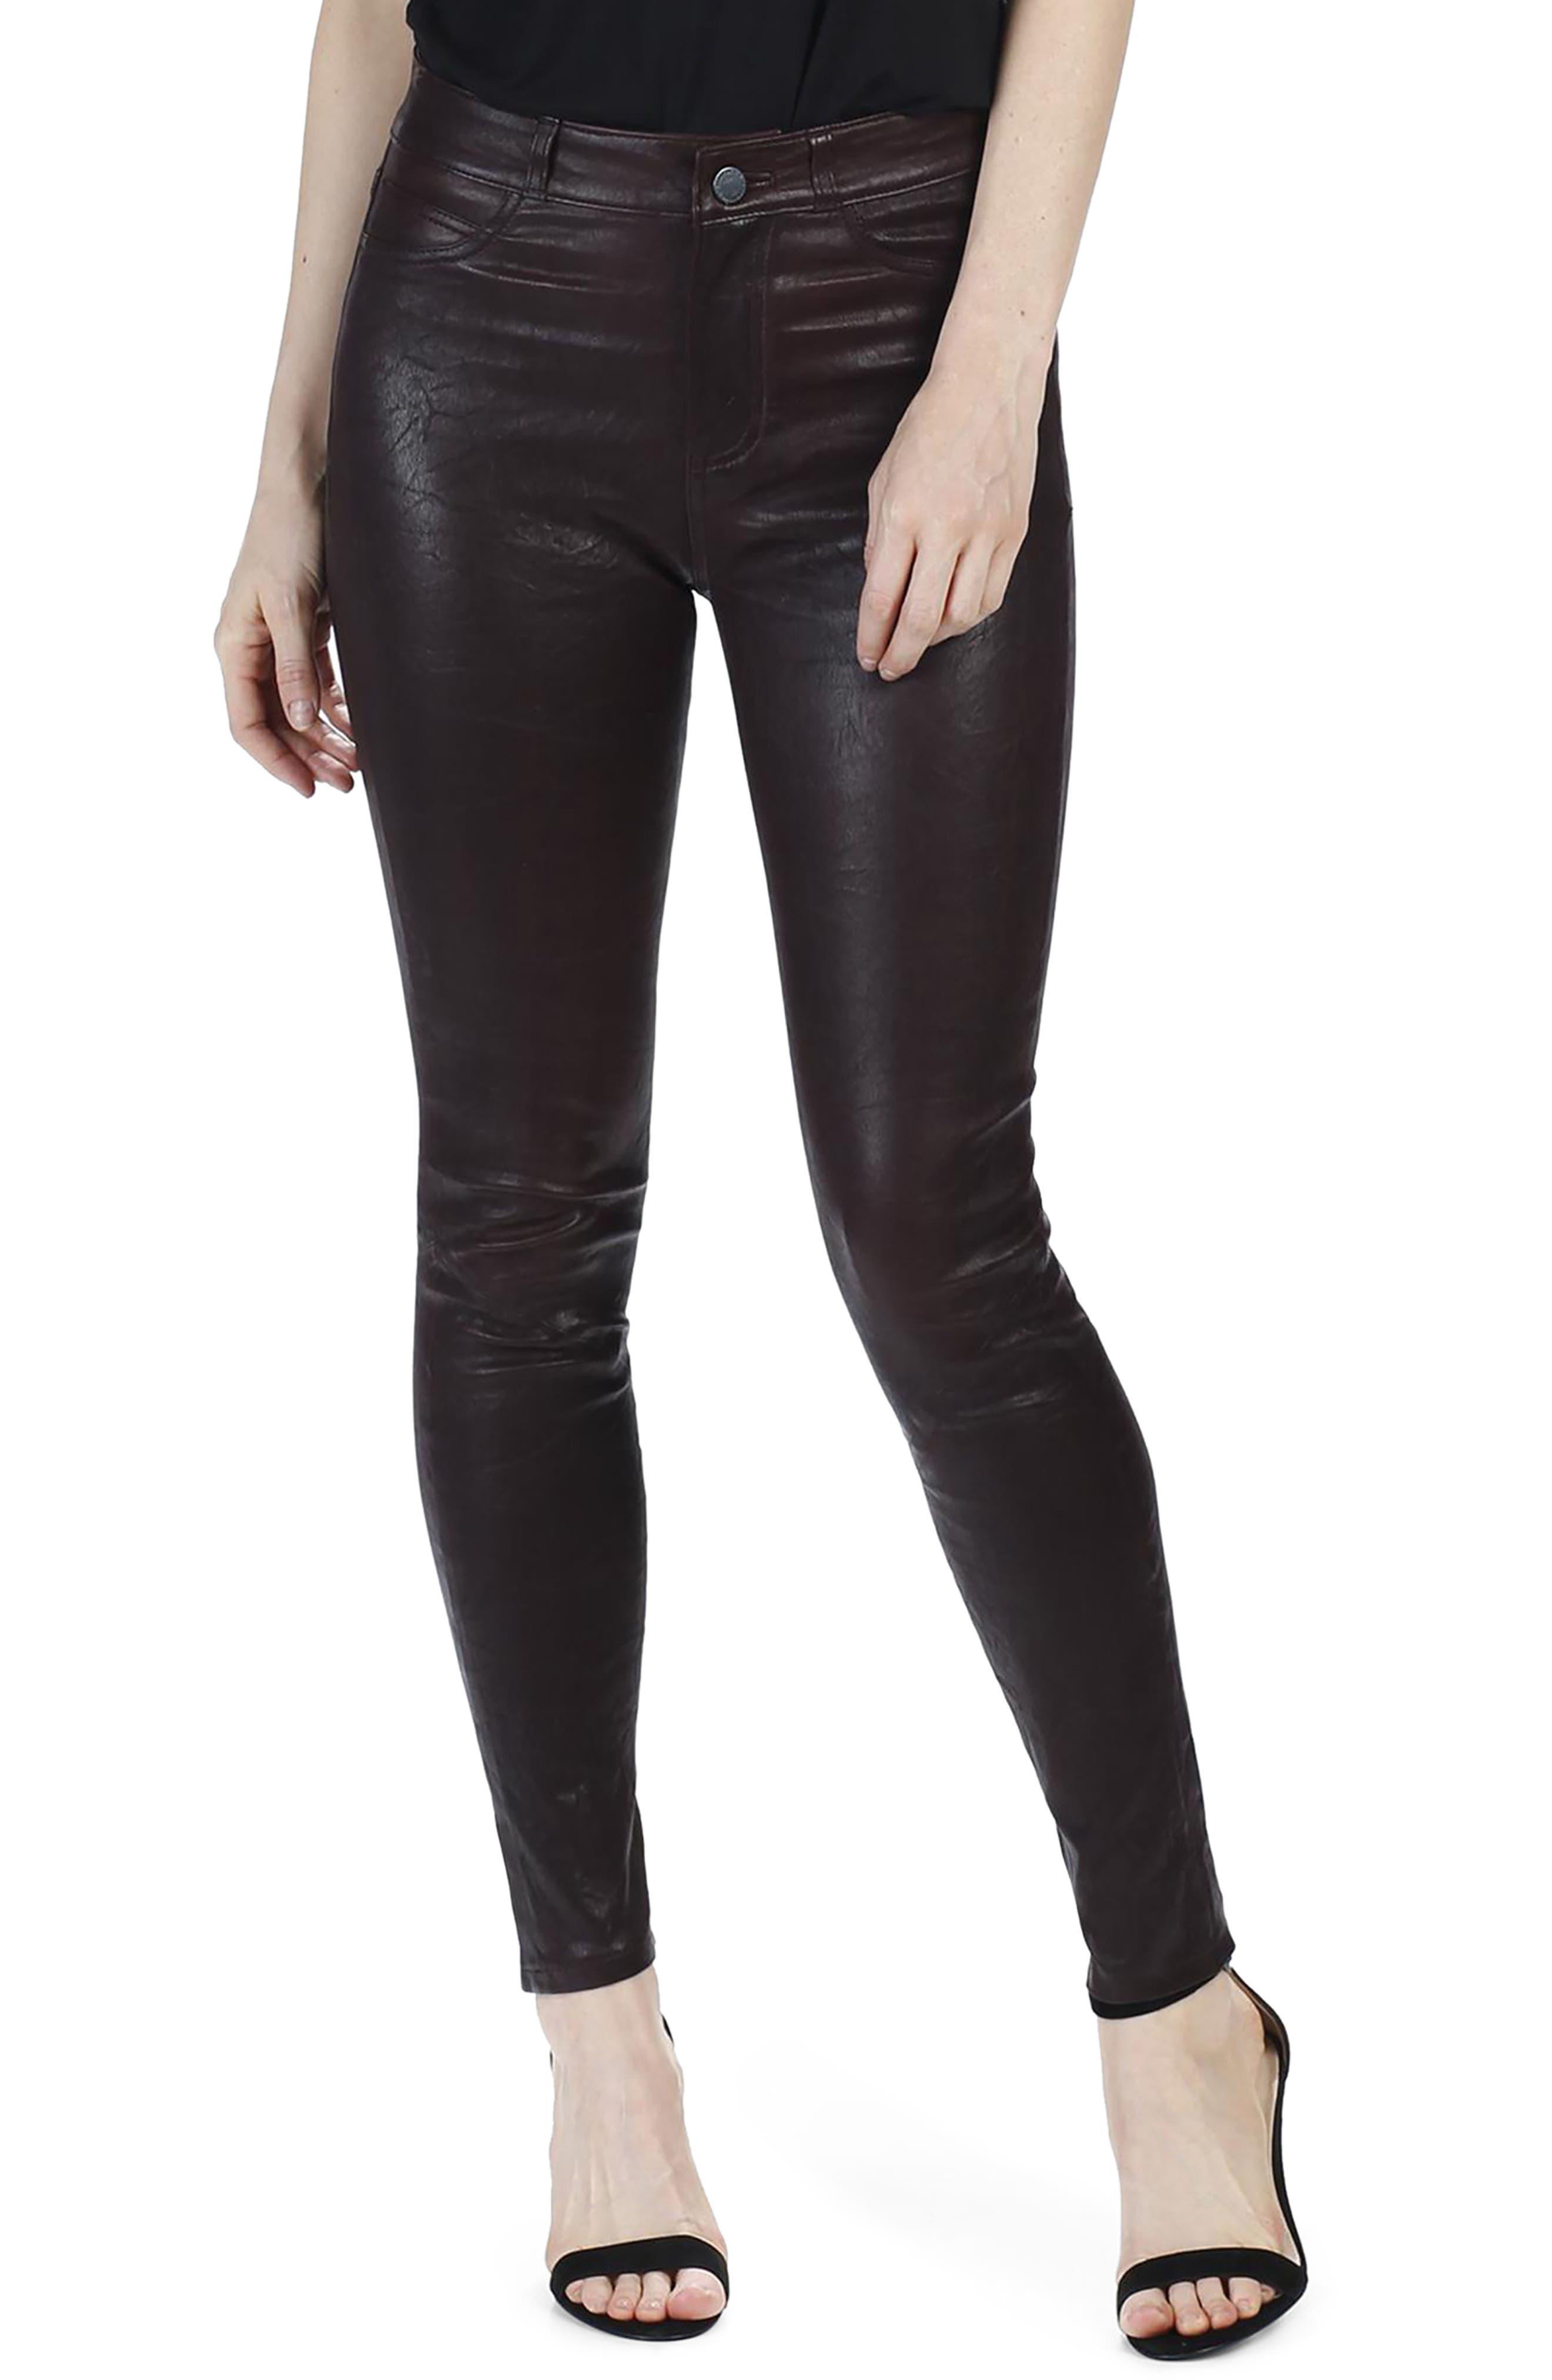 Black leather leggings melbourne